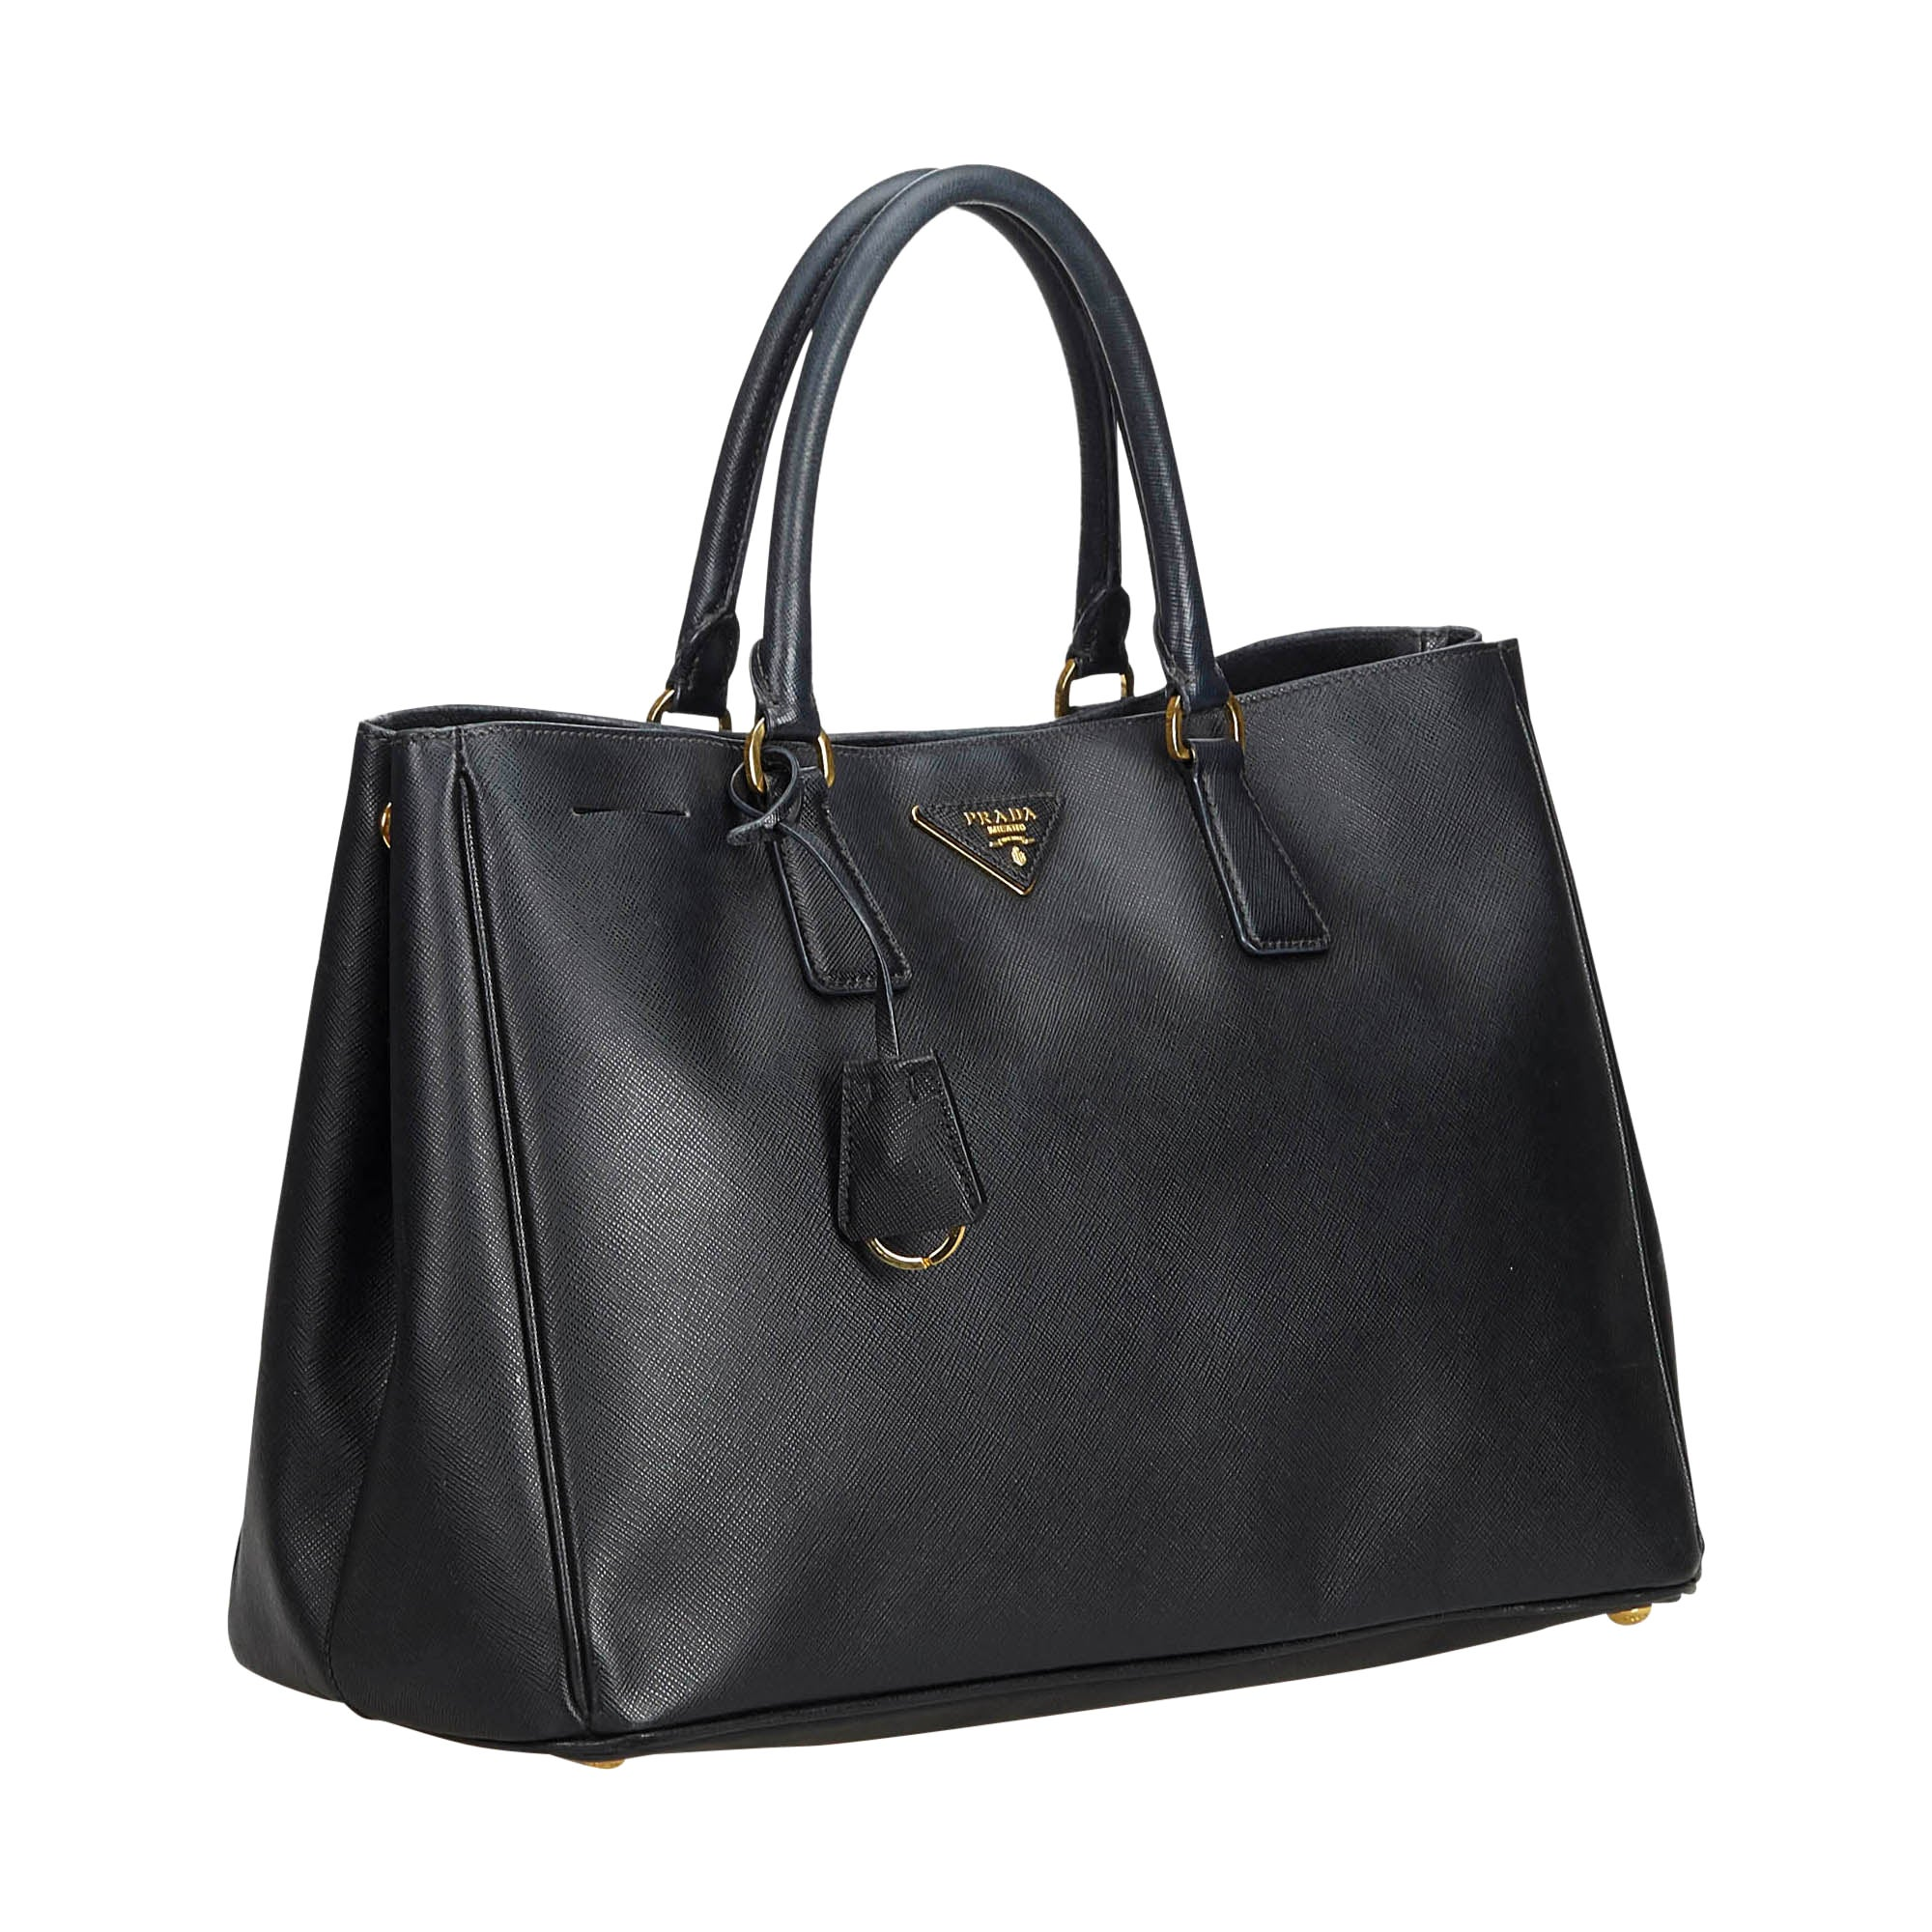 c3bc0c3ea7 Prada Black Leather Saffiano Galleria Handbag For Sale at 1stdibs